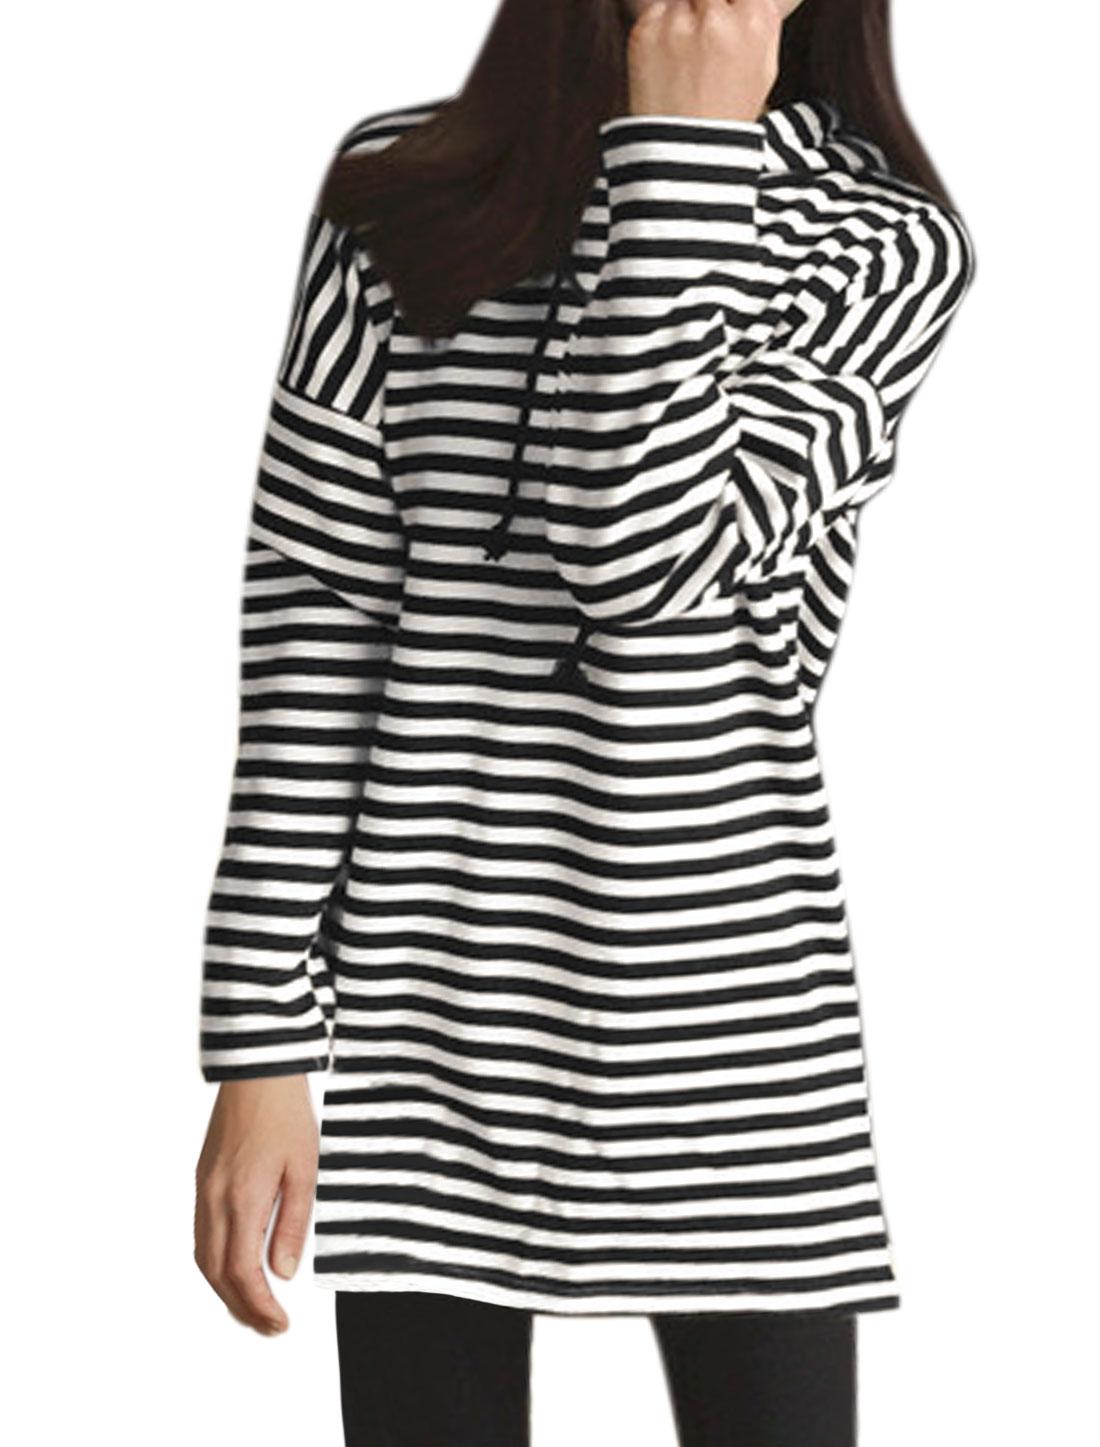 Ladies Stripes Hooded Tunic Sweatshirt Black White XS